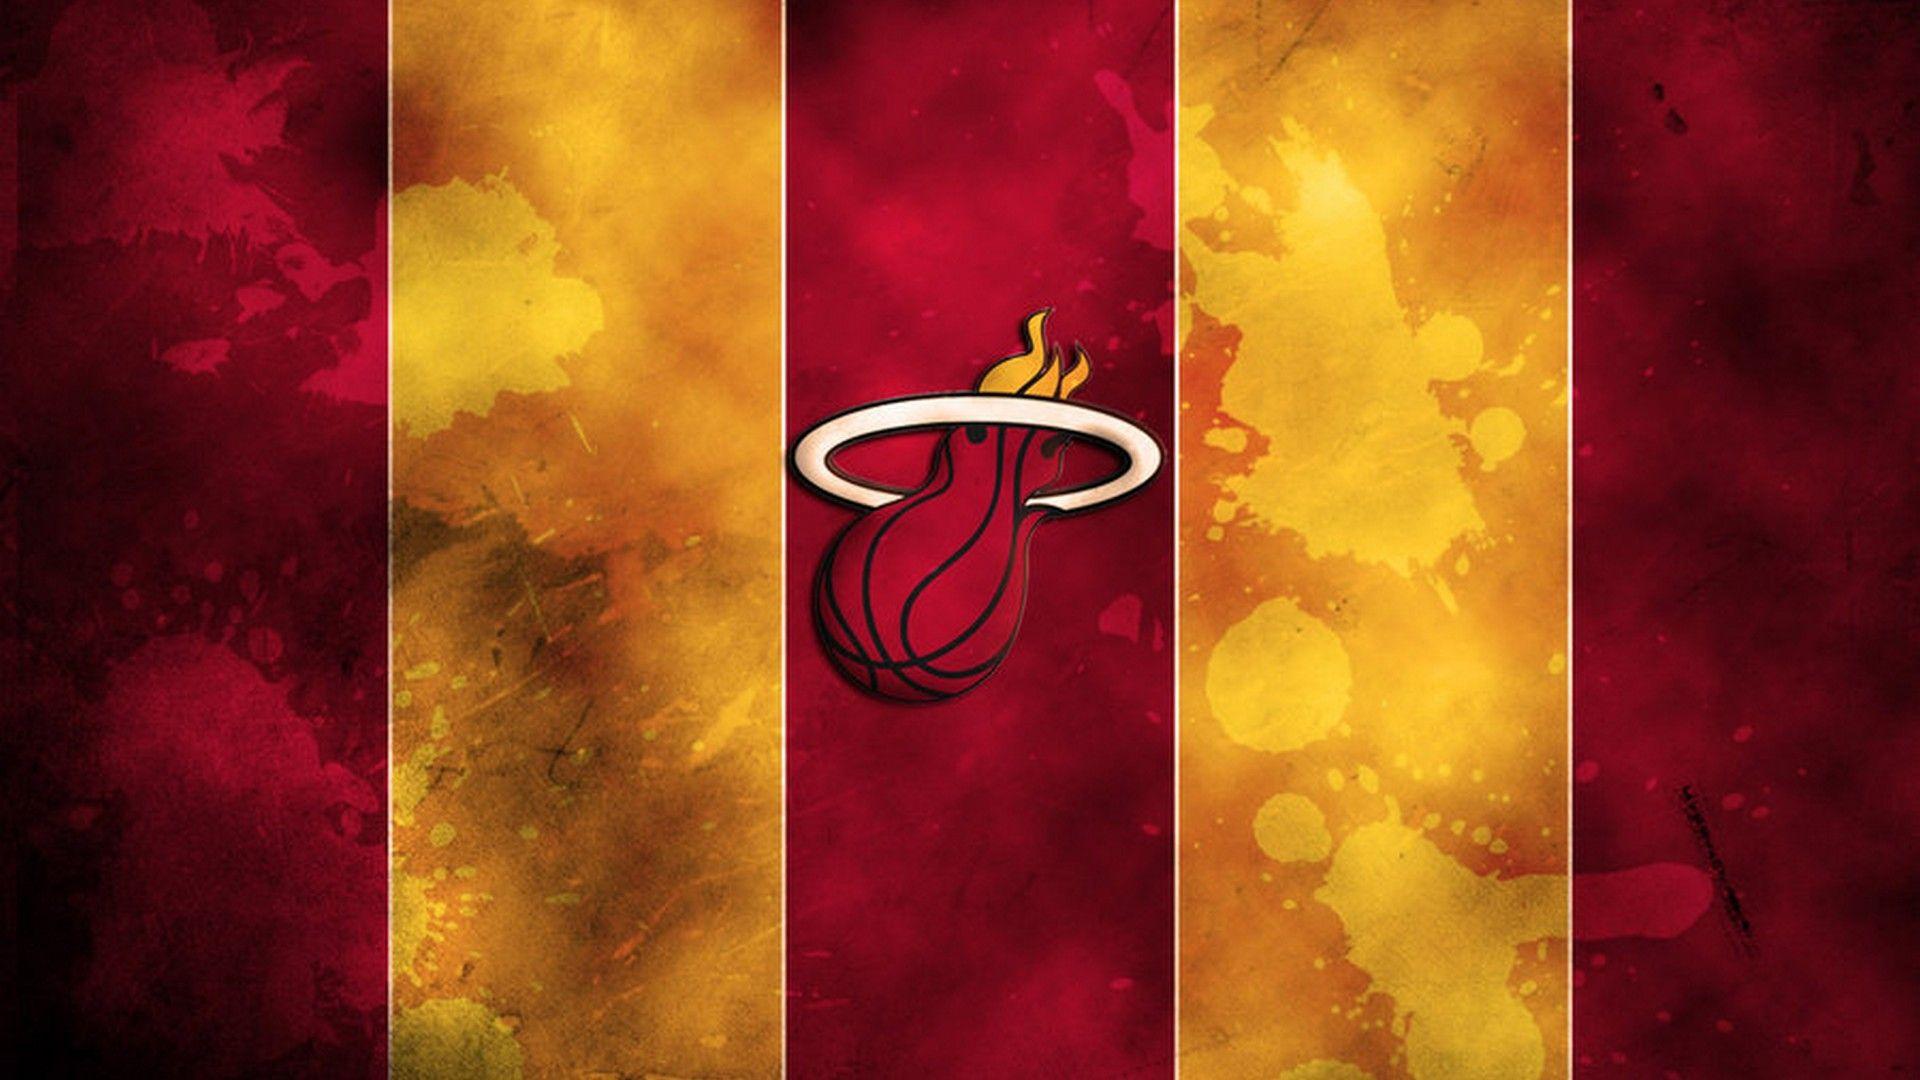 Miami Heat Desktop Wallpaper 2020 Basketball Wallpaper Miami Heat Basketball Wallpaper Miami Heat Logo